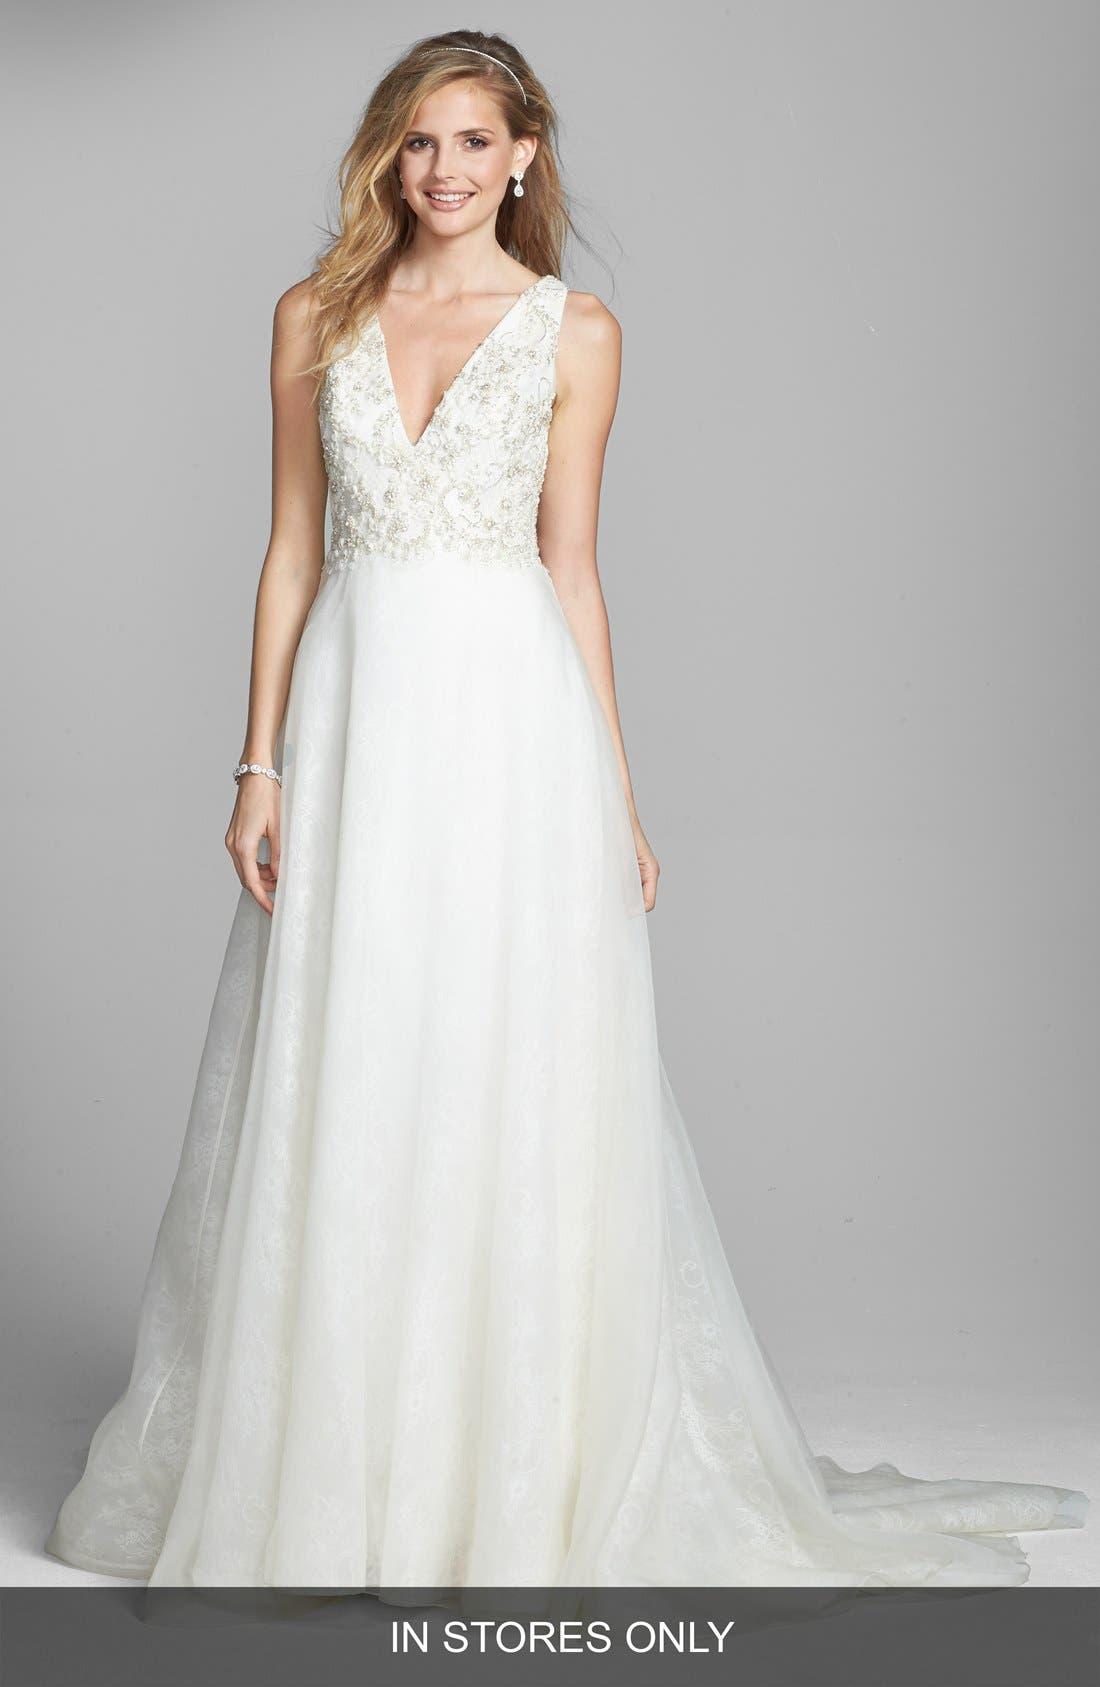 Alternate Image 1 Selected - Badgley Mischka Bridal 'Lana' Embellished Silk Organza Dress (In Stores Only)